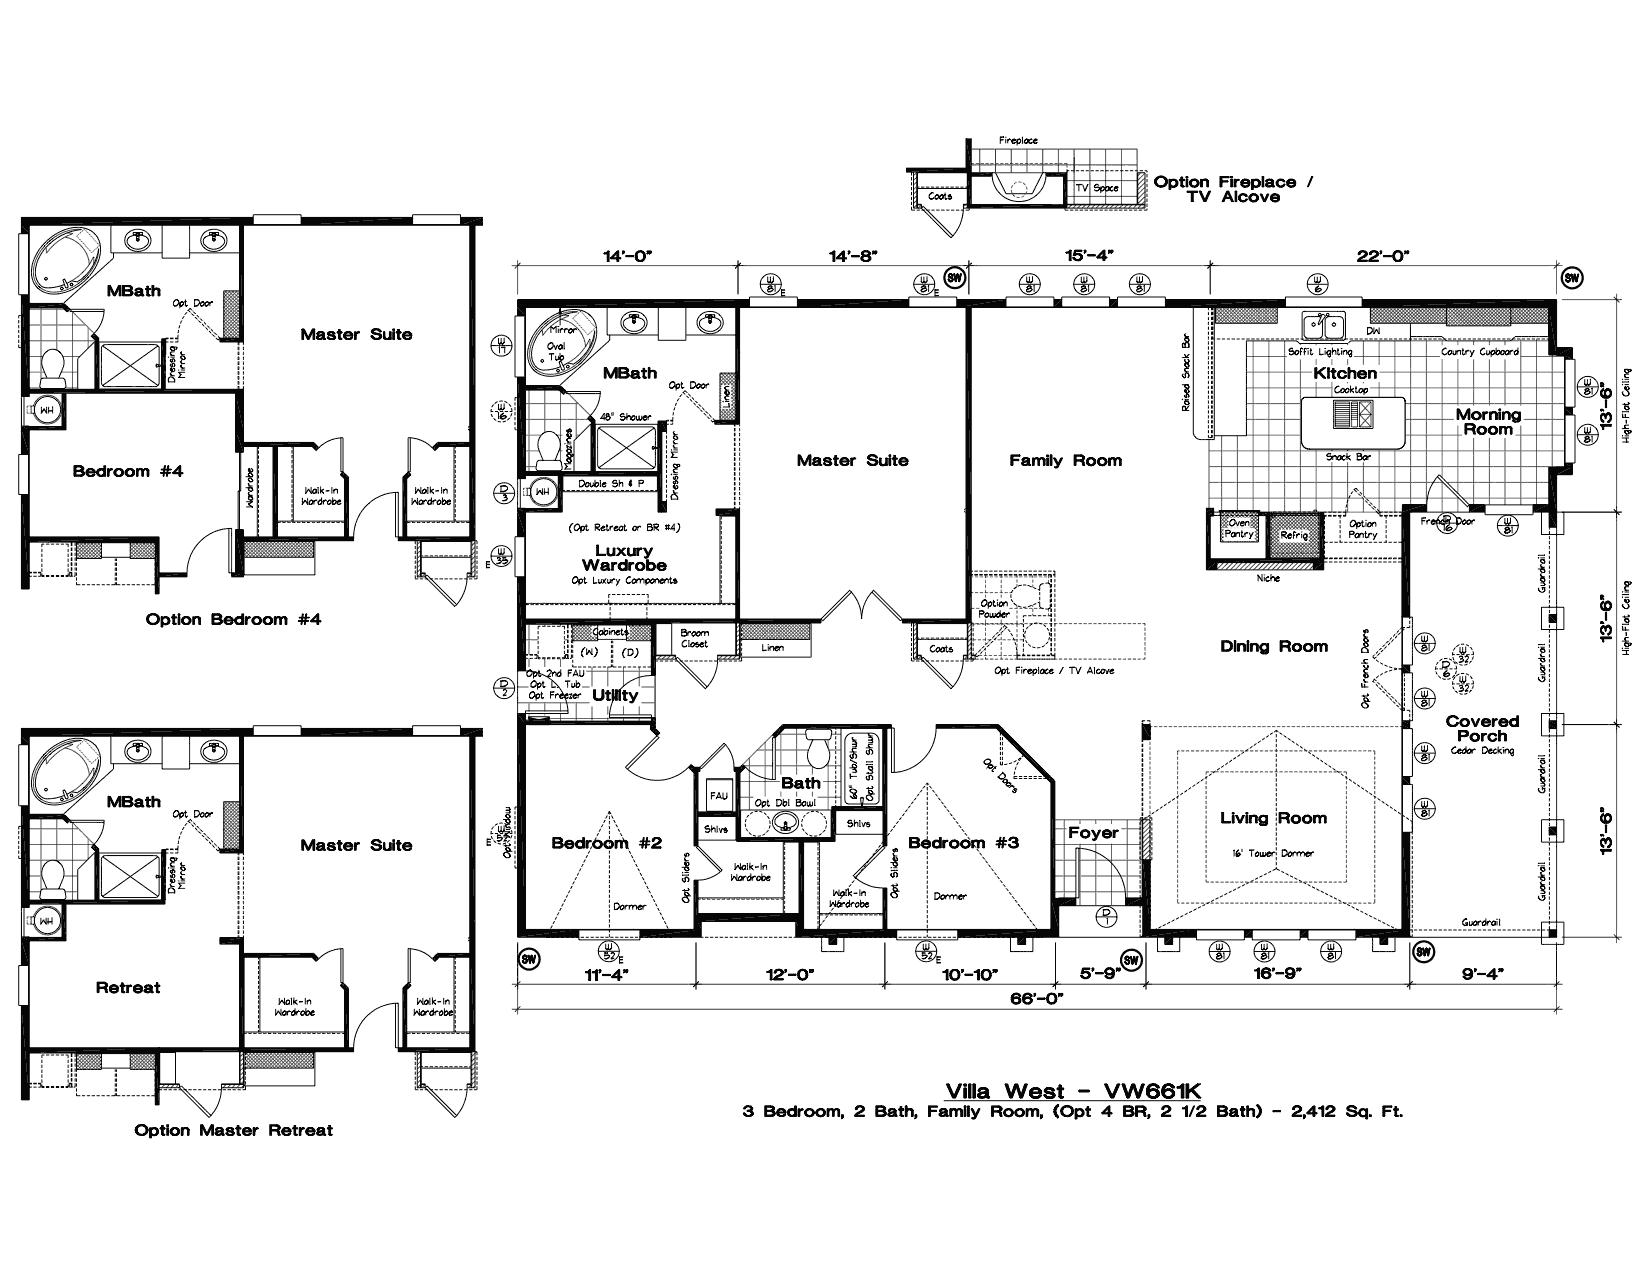 House Plans Plan Home Design Software Kitchen House Plans 23989